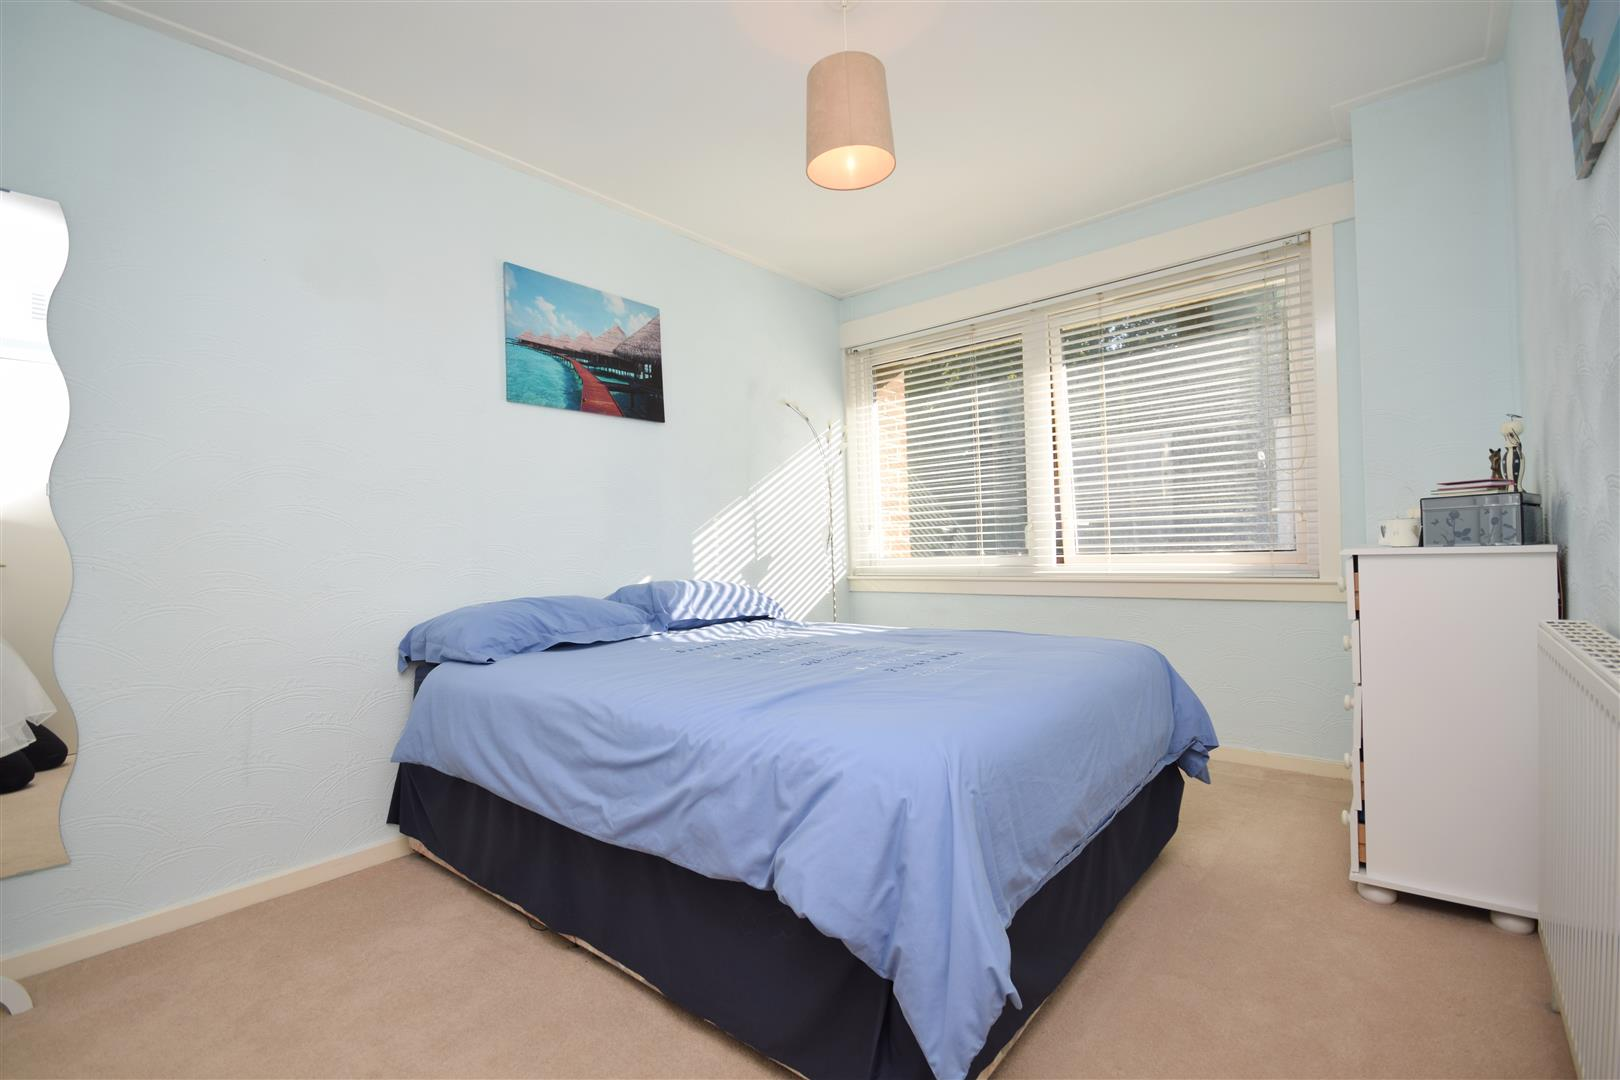 35, Primrose Crescent, Perth, Perthshire, PH1 2QG, UK